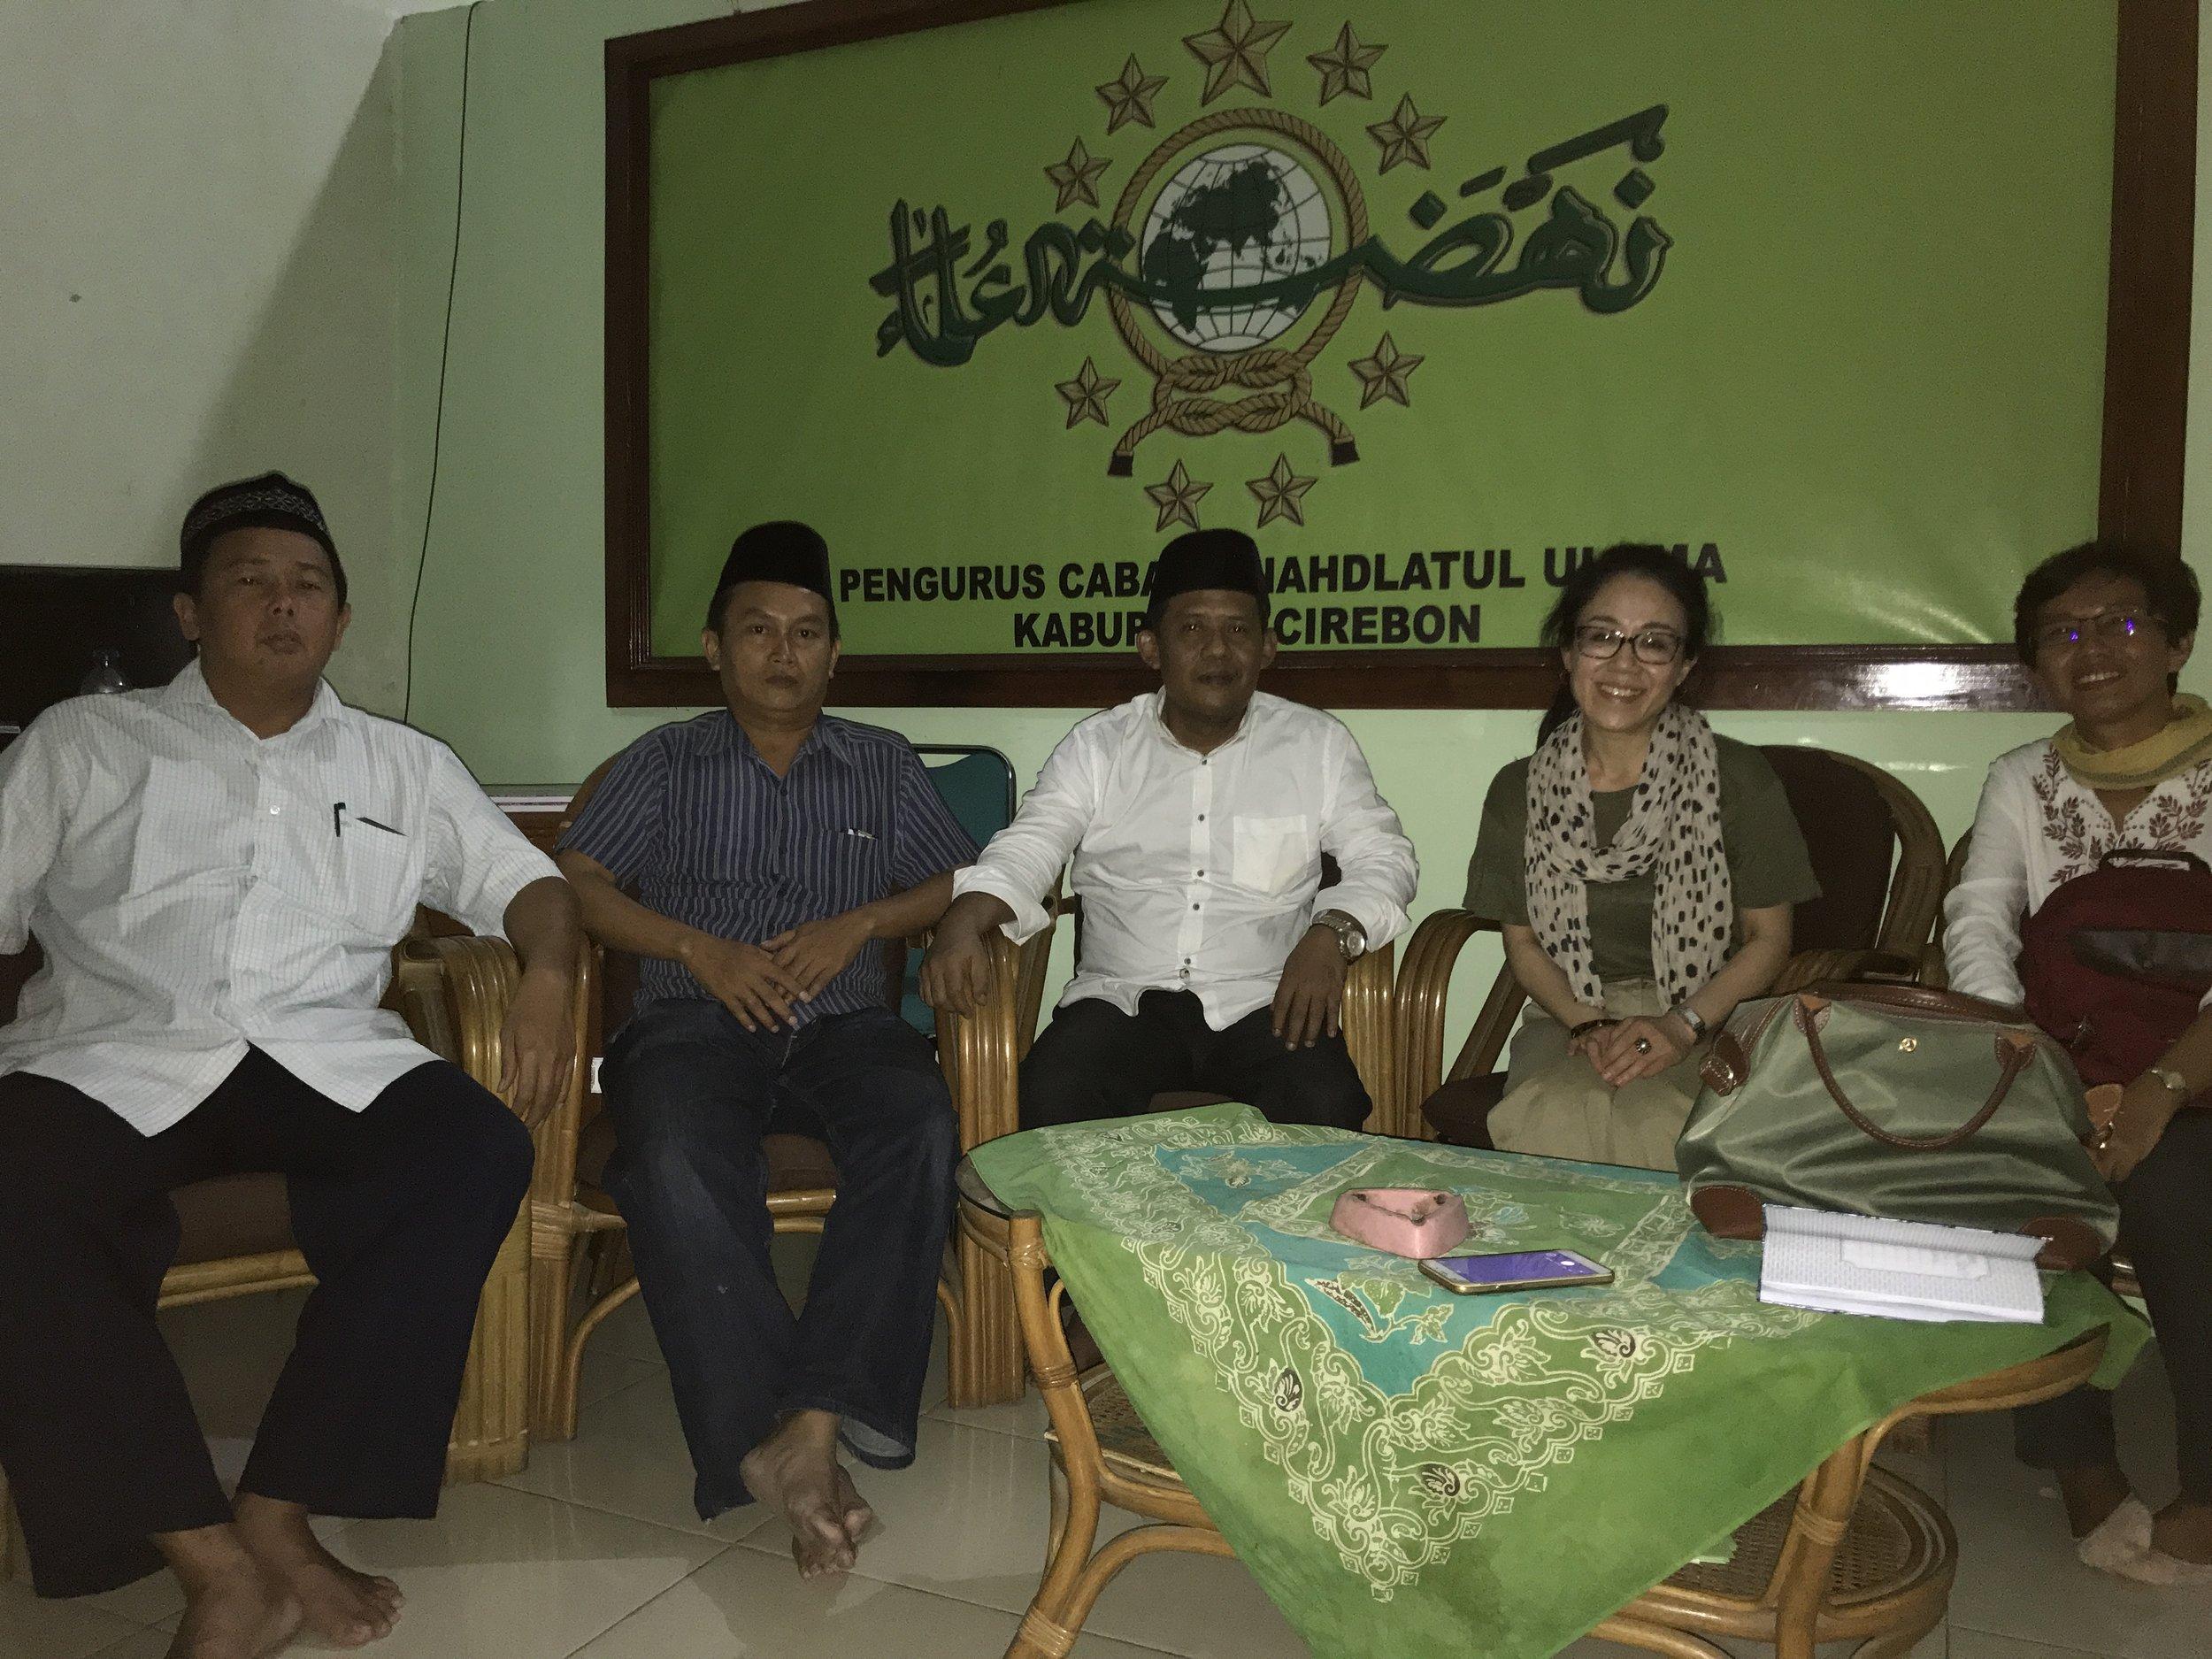 Dr. Kikue Hamayostu conducting research in Indonesia.